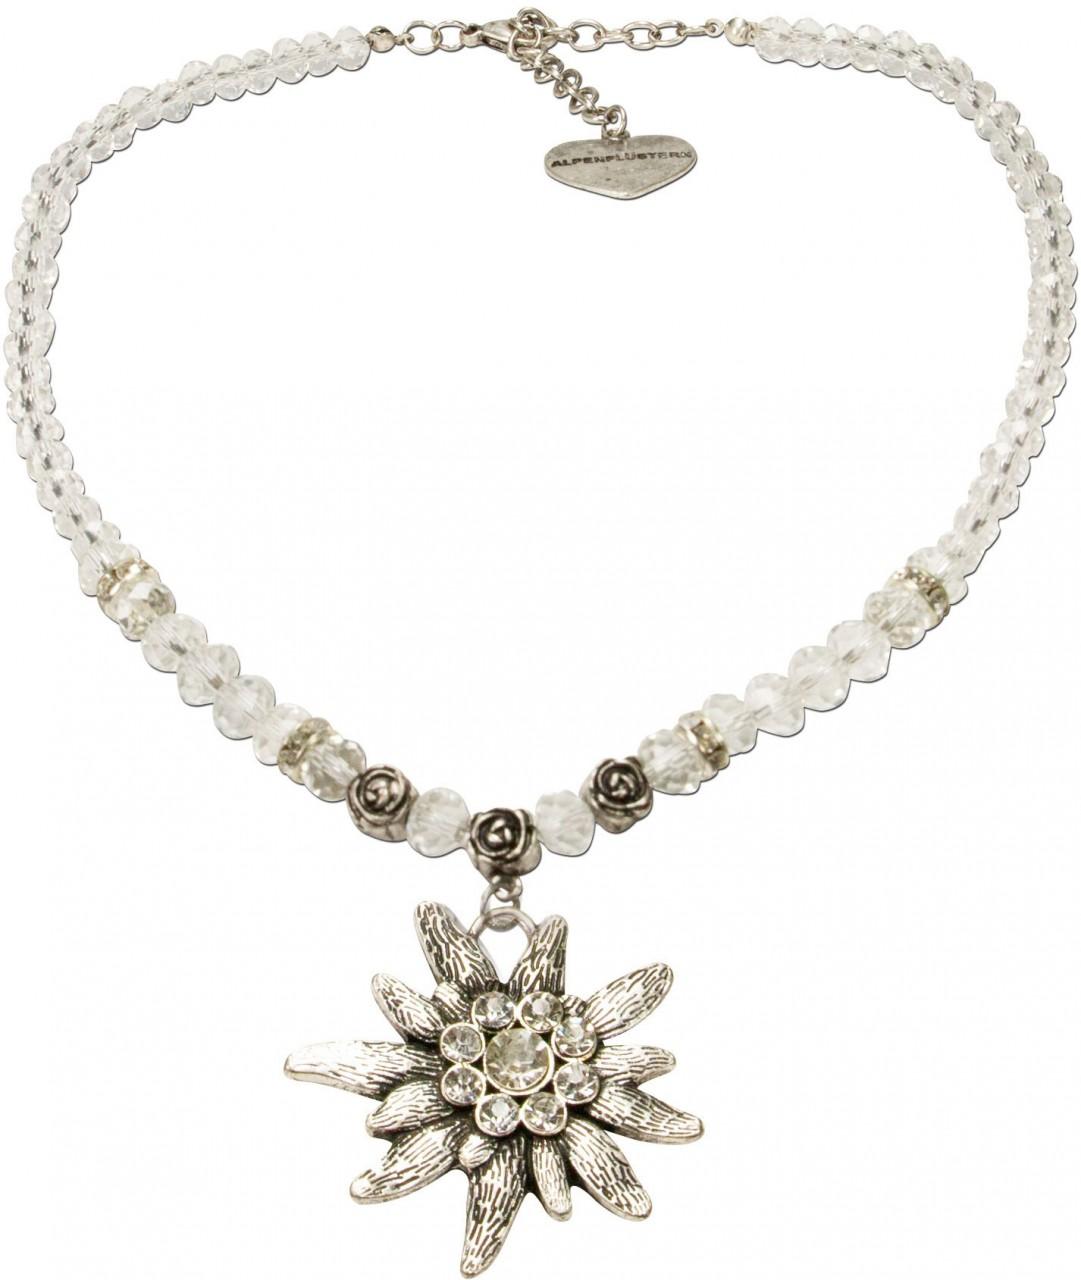 Trachten necklace big edelweiss nature